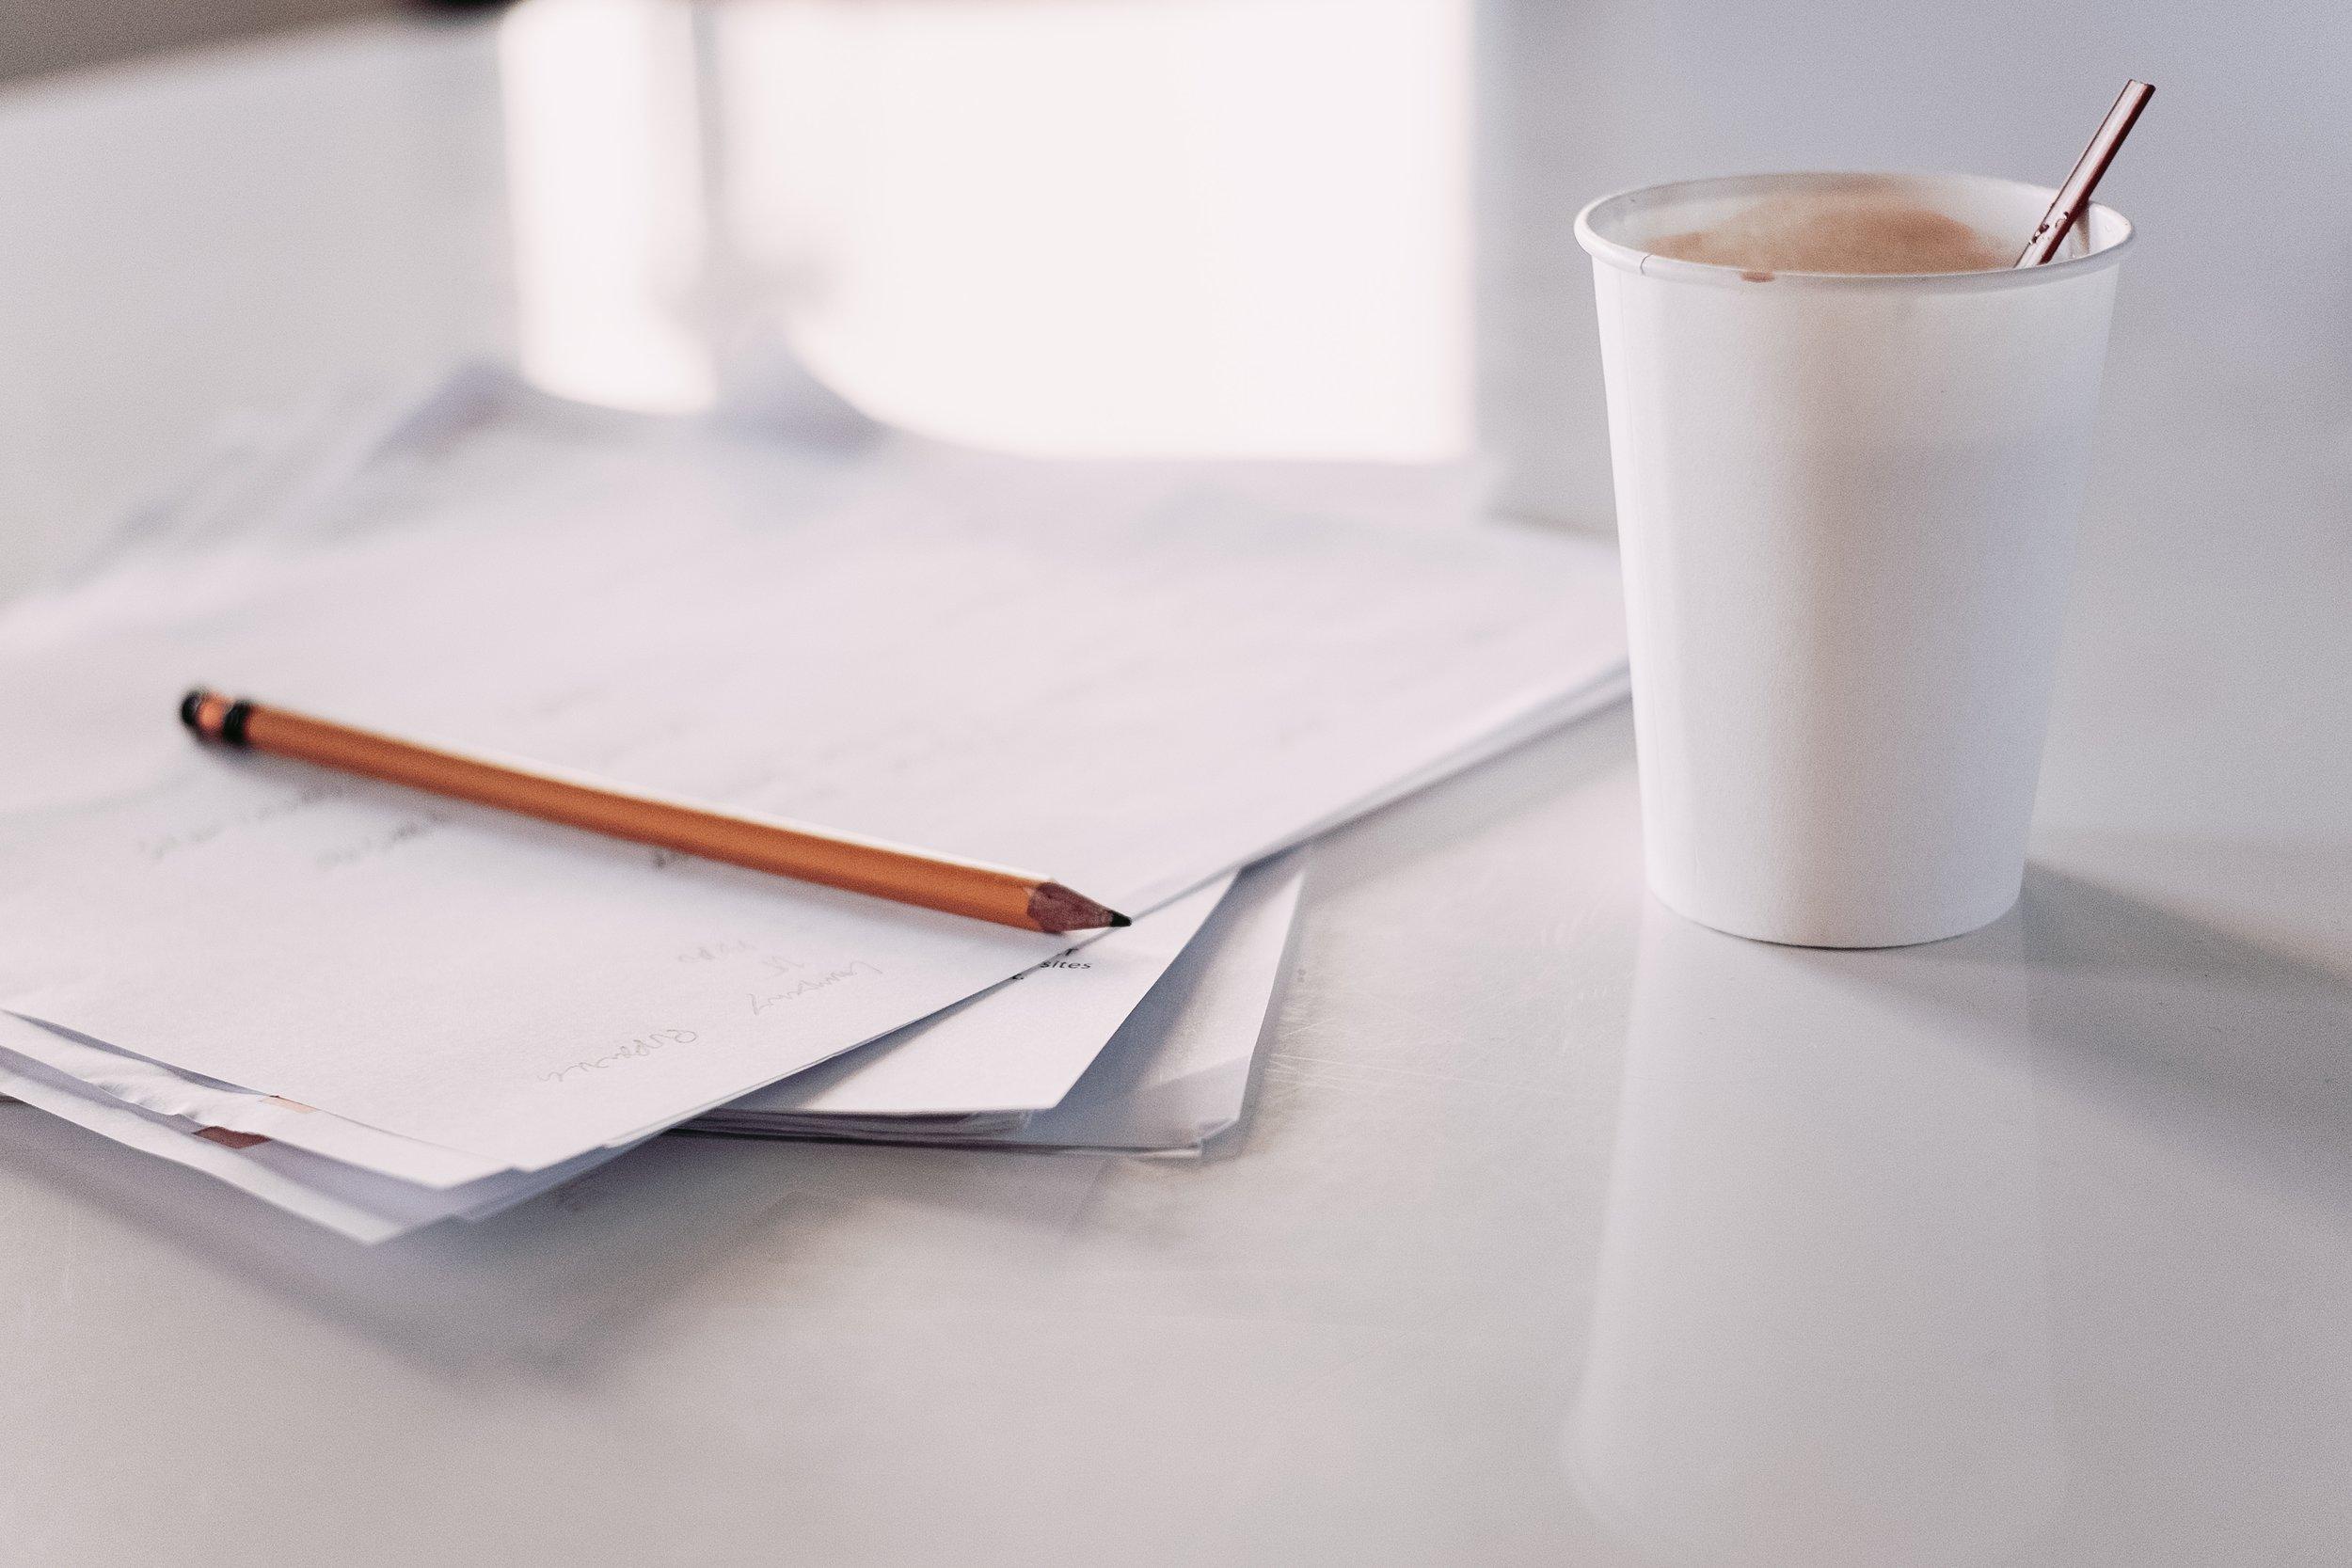 pencil on paper with coffee cup rainier-ridao-569546-unsplash.jpg